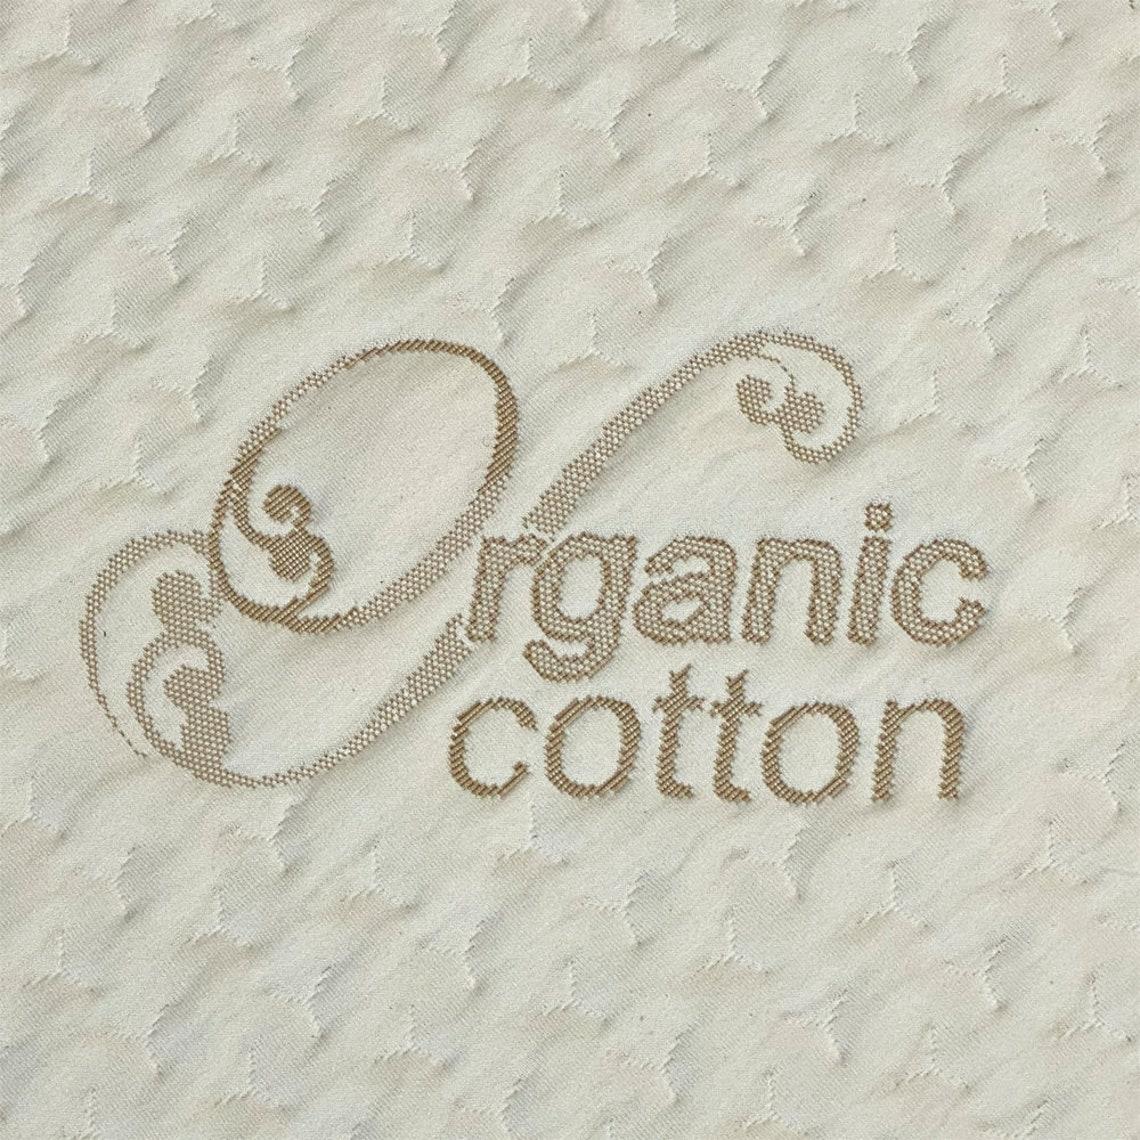 "RV Bunk Mattress 36"" x 72"" x 4""- 7"", High-Density Foam, Organic Cotton Cover, Made in USA"